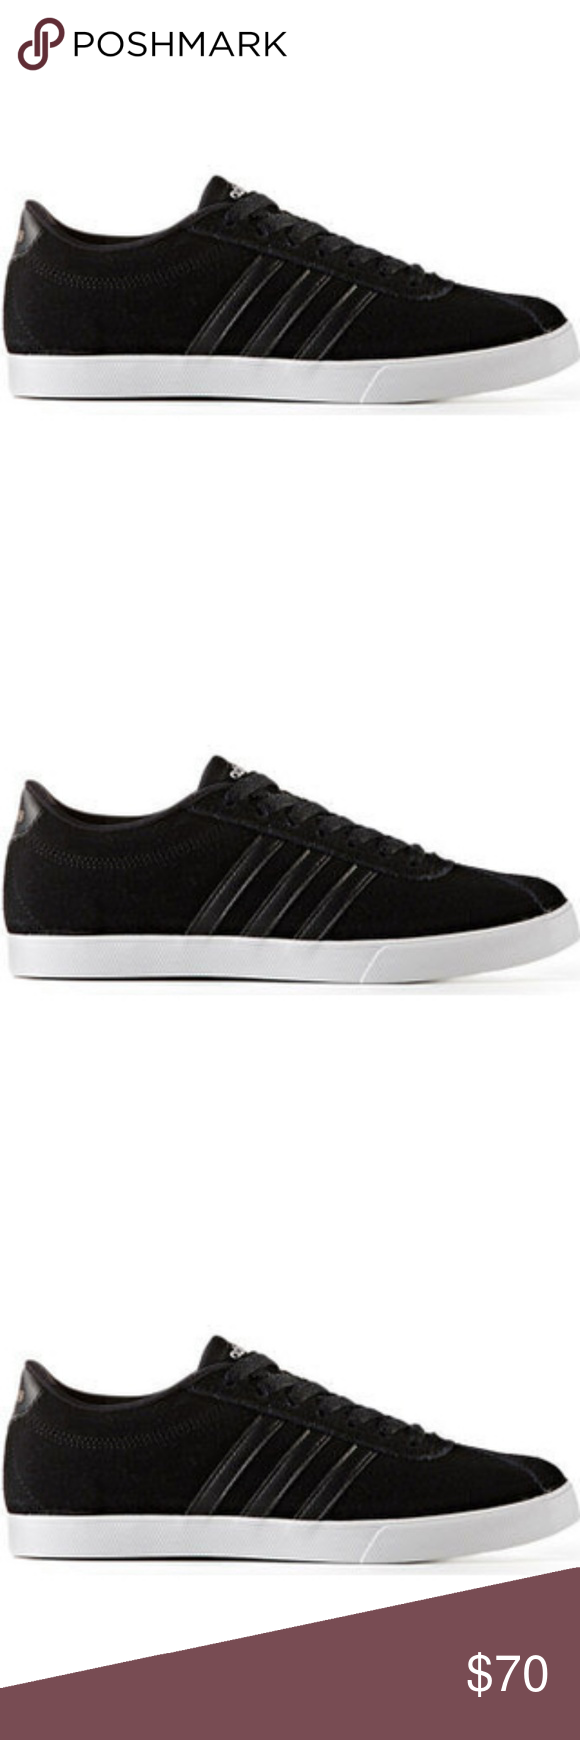 black adidas neo courtset le scarpe di camoscio adidas neo courtset